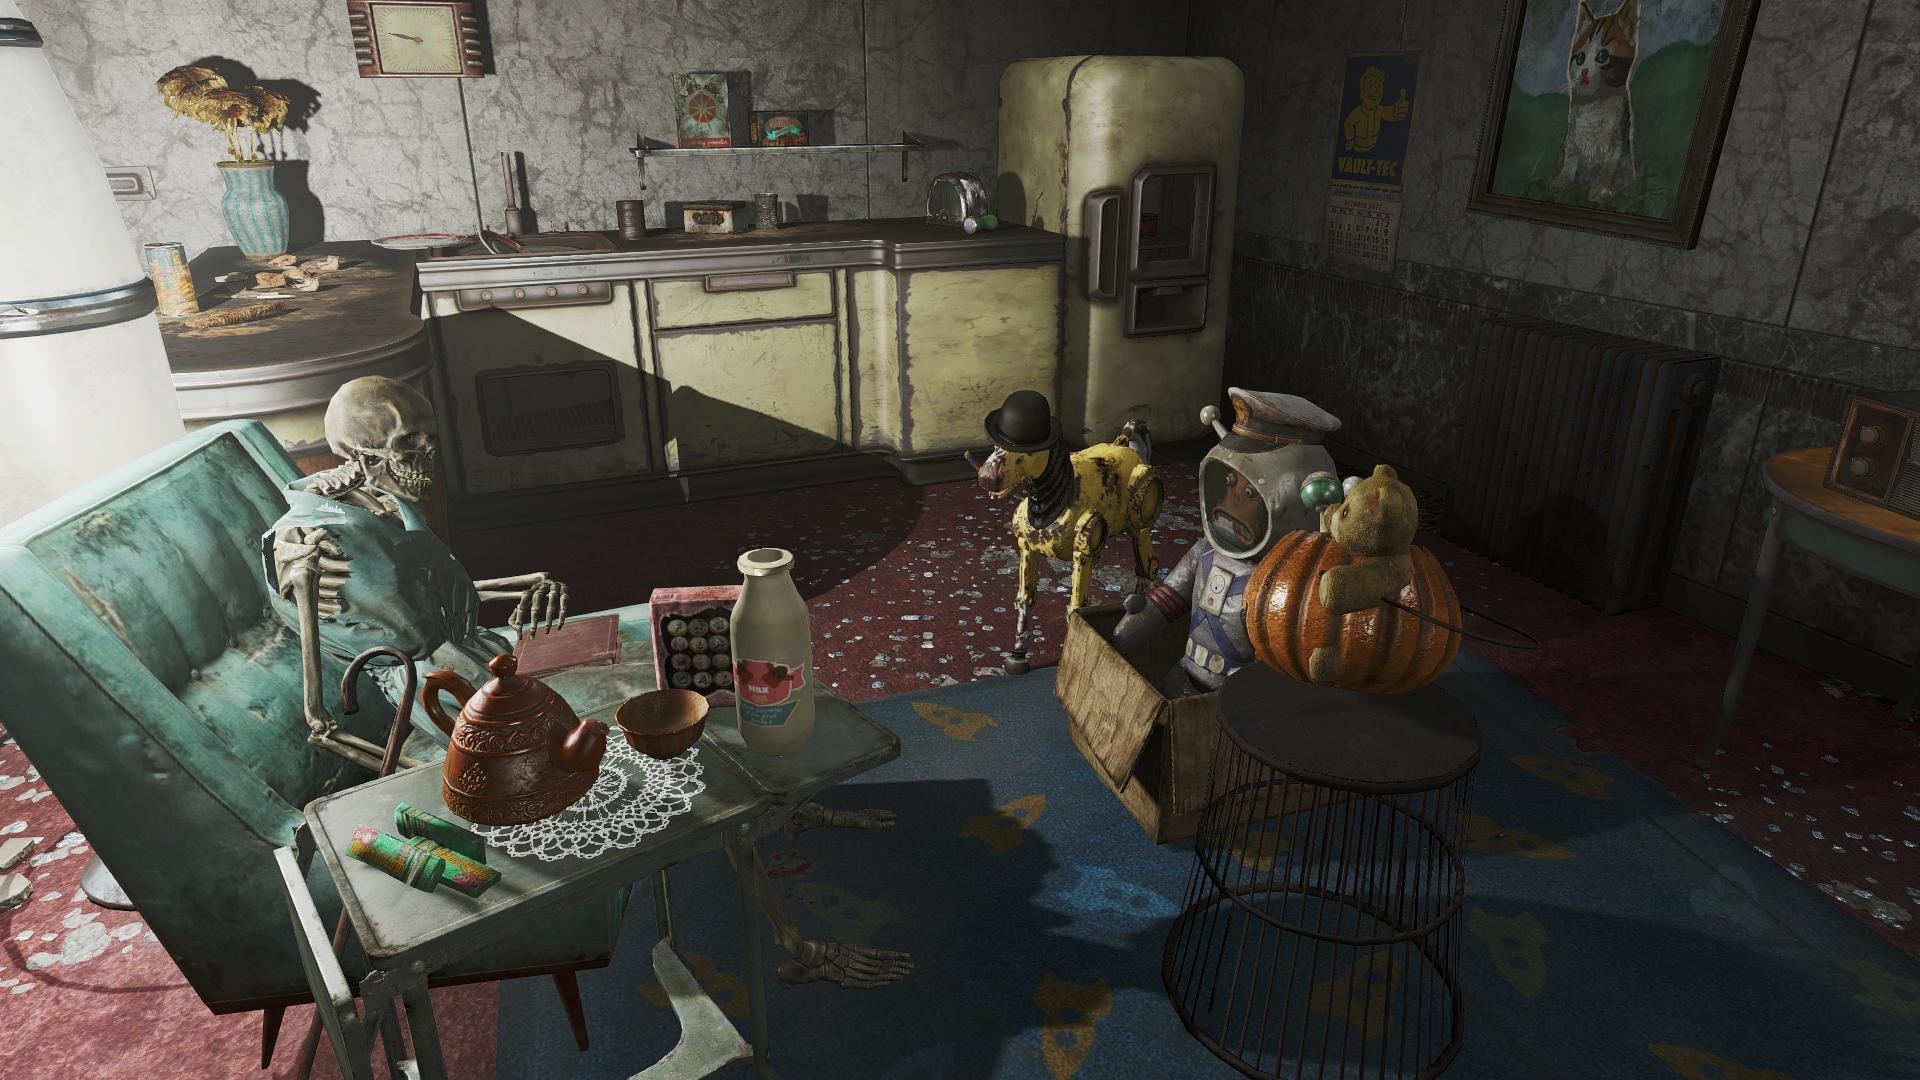 000290.Jpg - Fallout 4